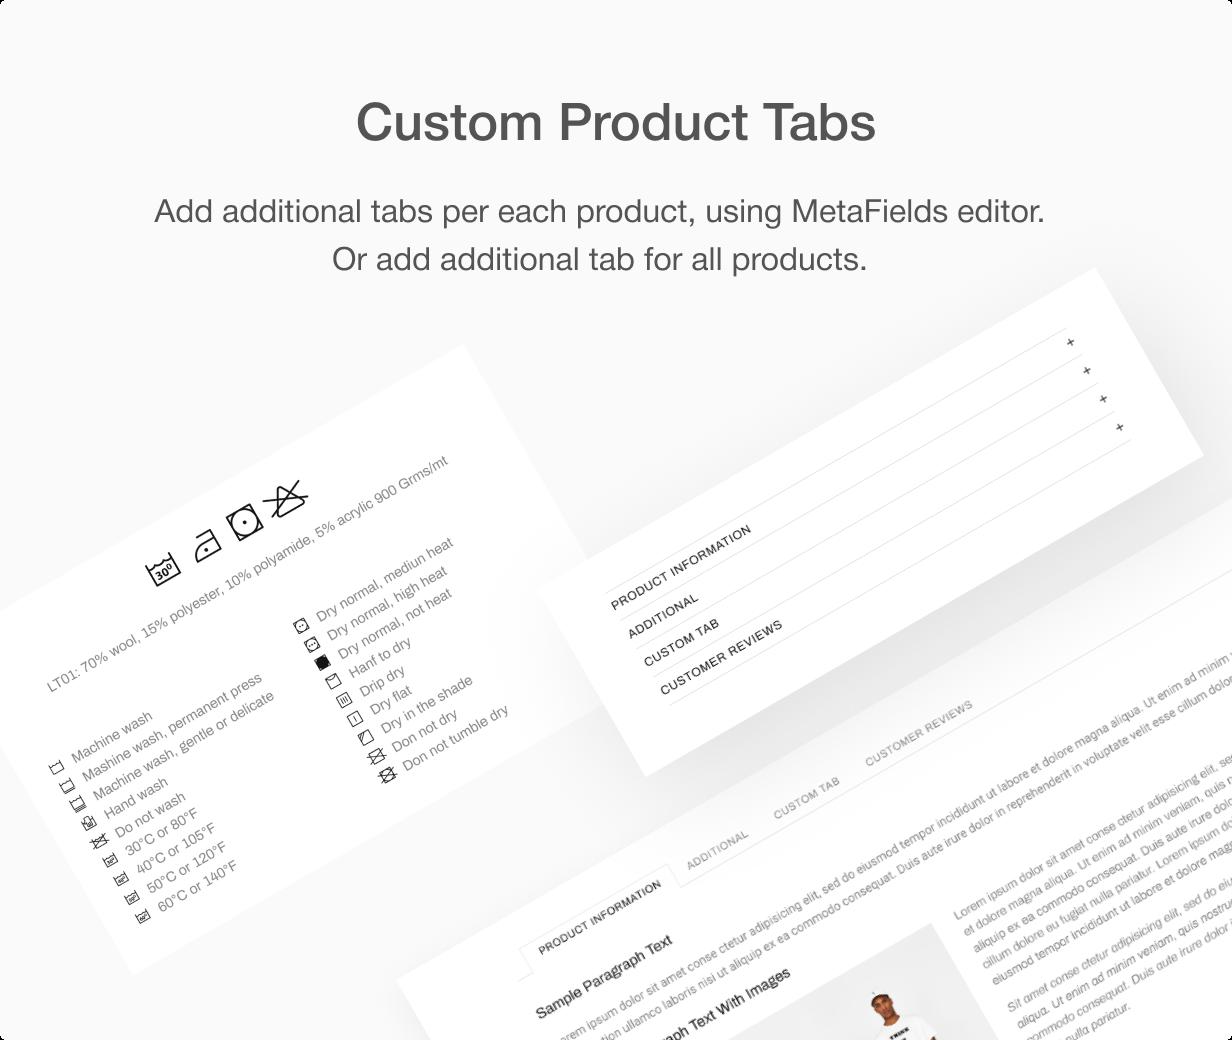 Custom product tabs at Shella Shopify theme